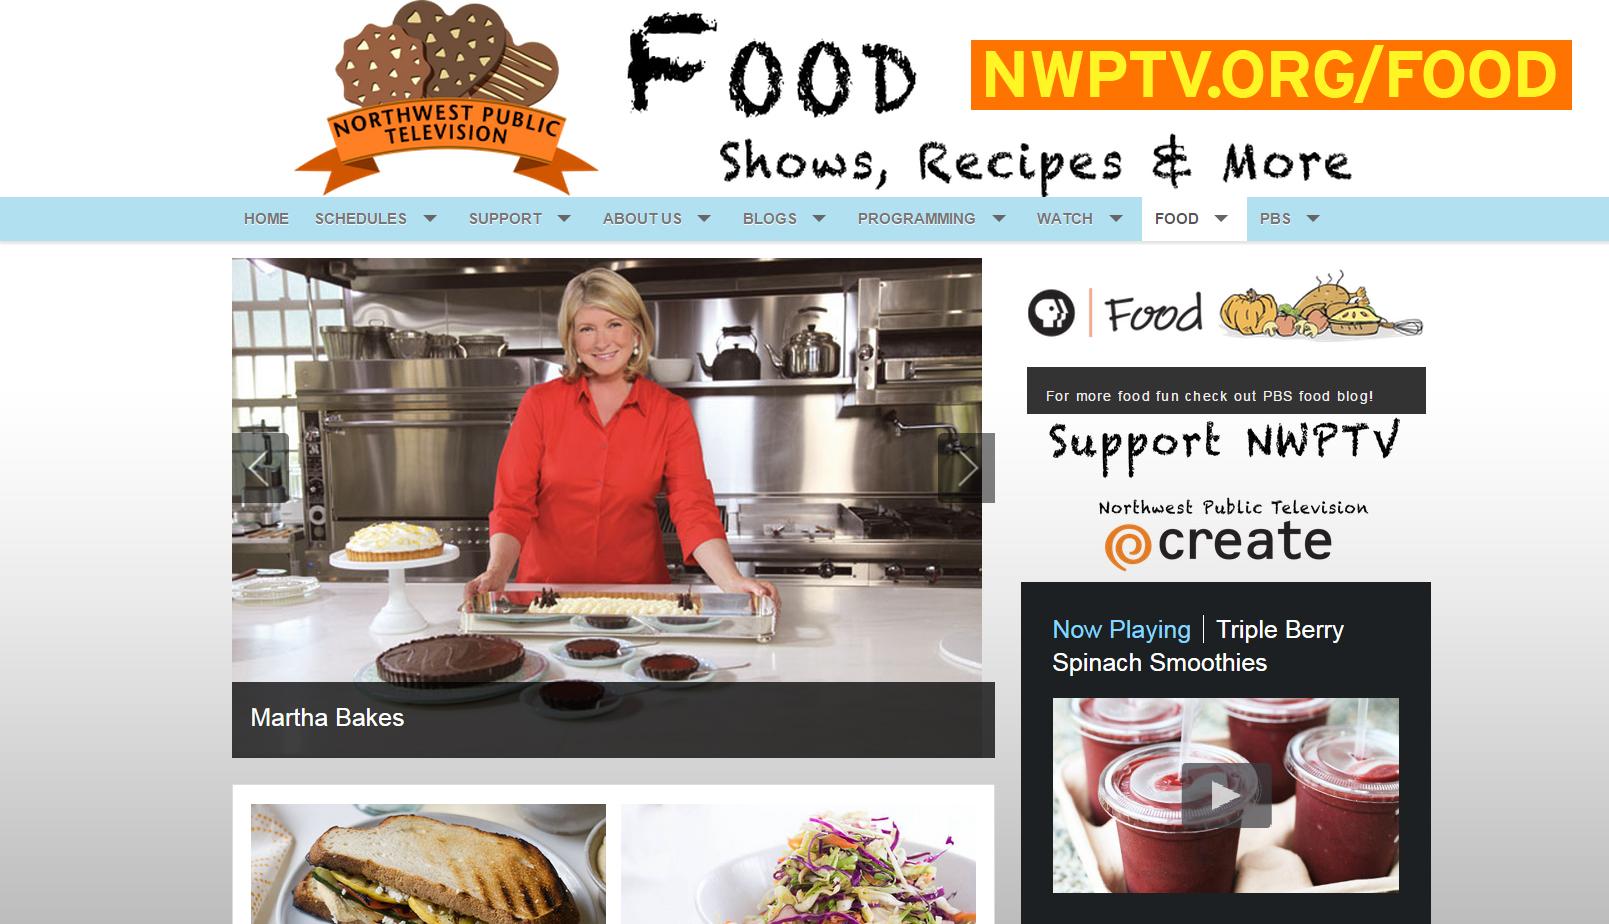 NWPTV Food